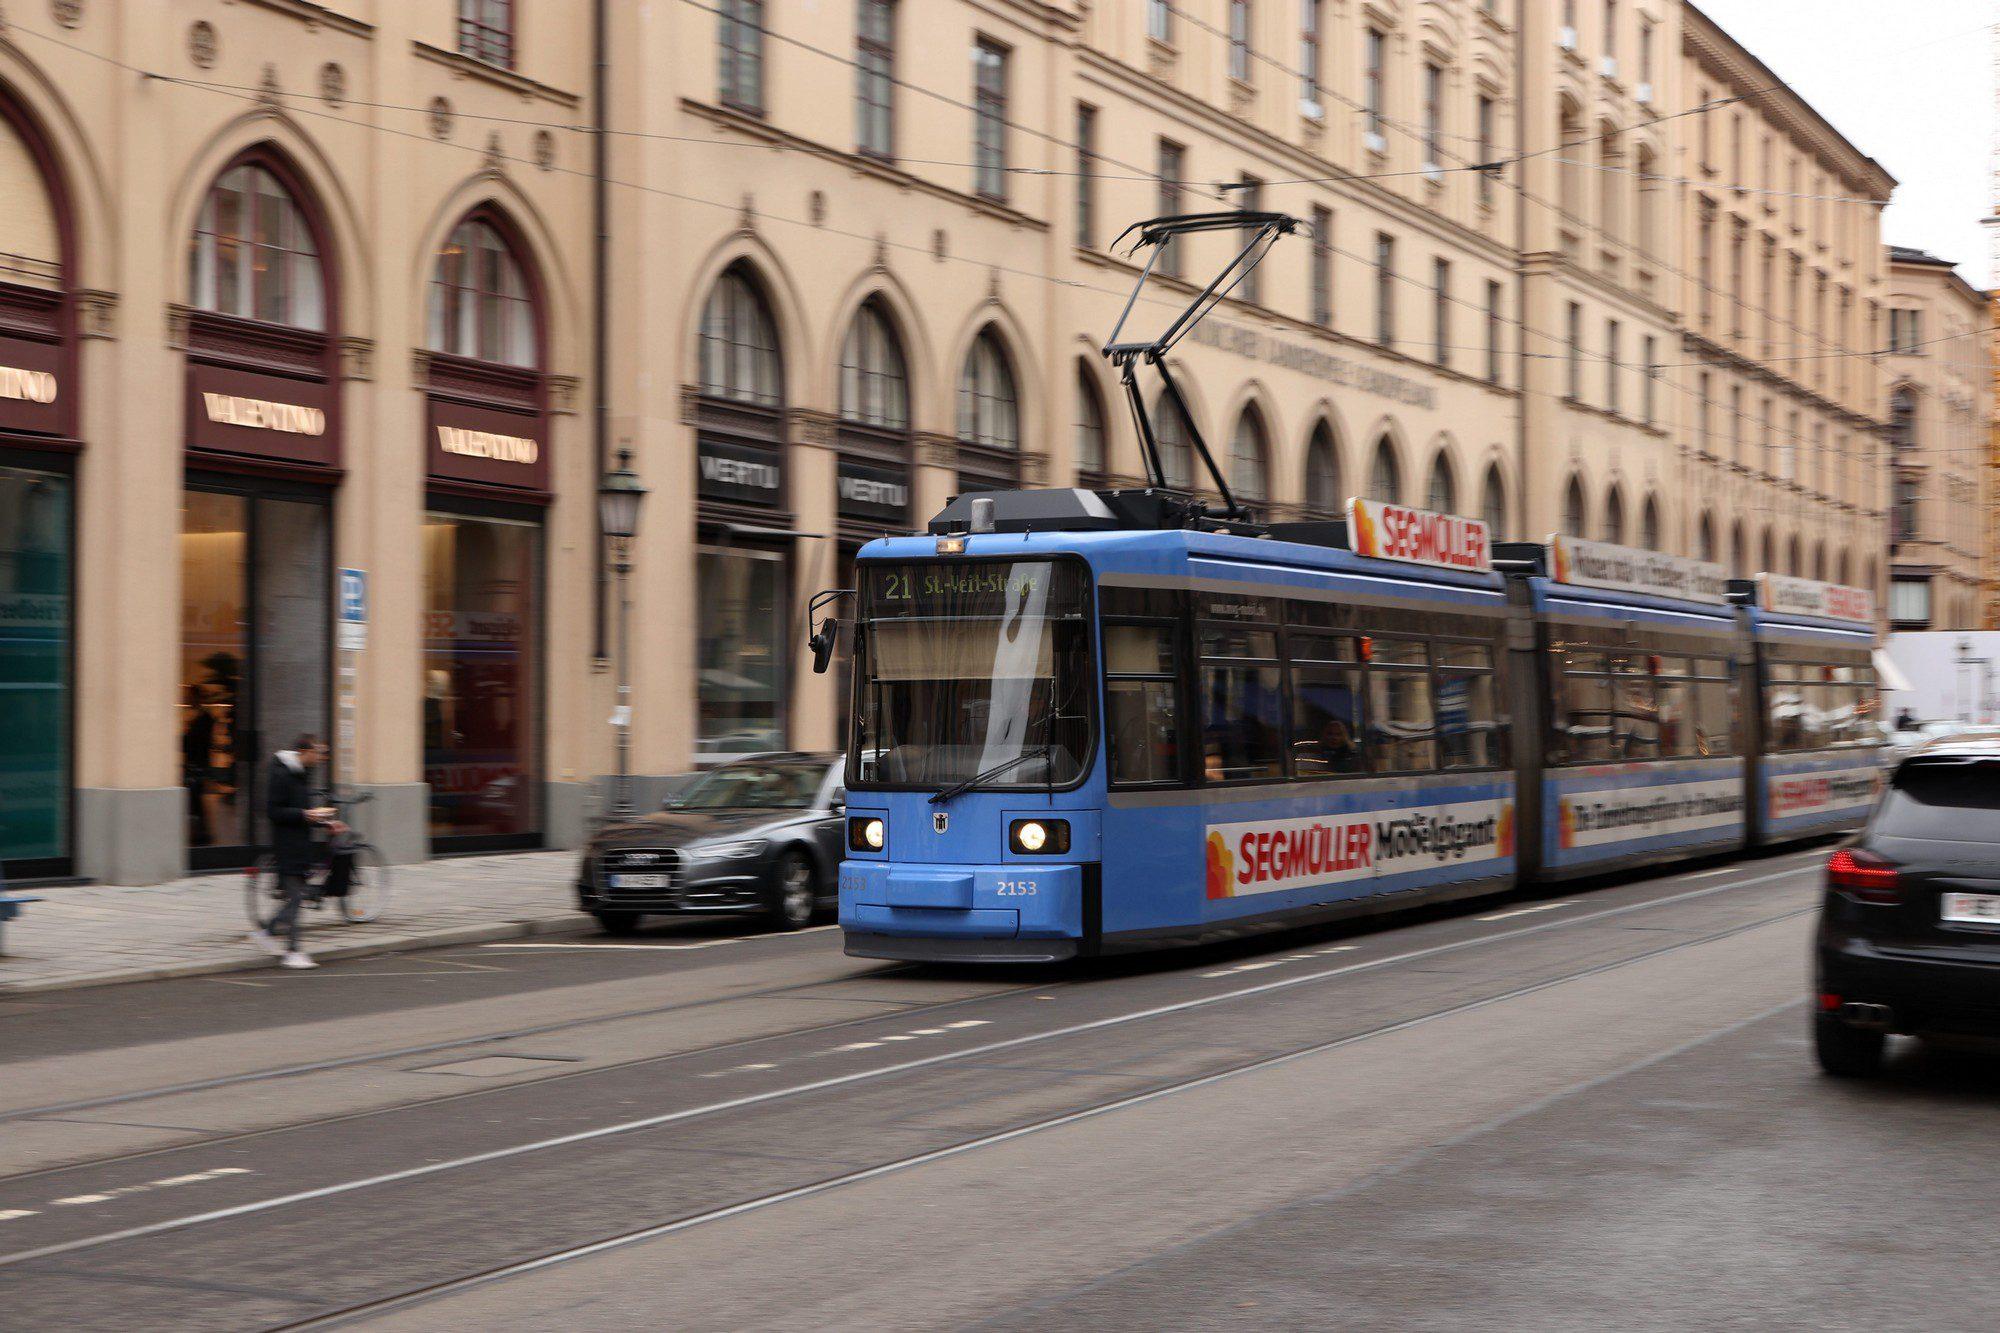 Trambahn in der Münchner Maximilianstraße